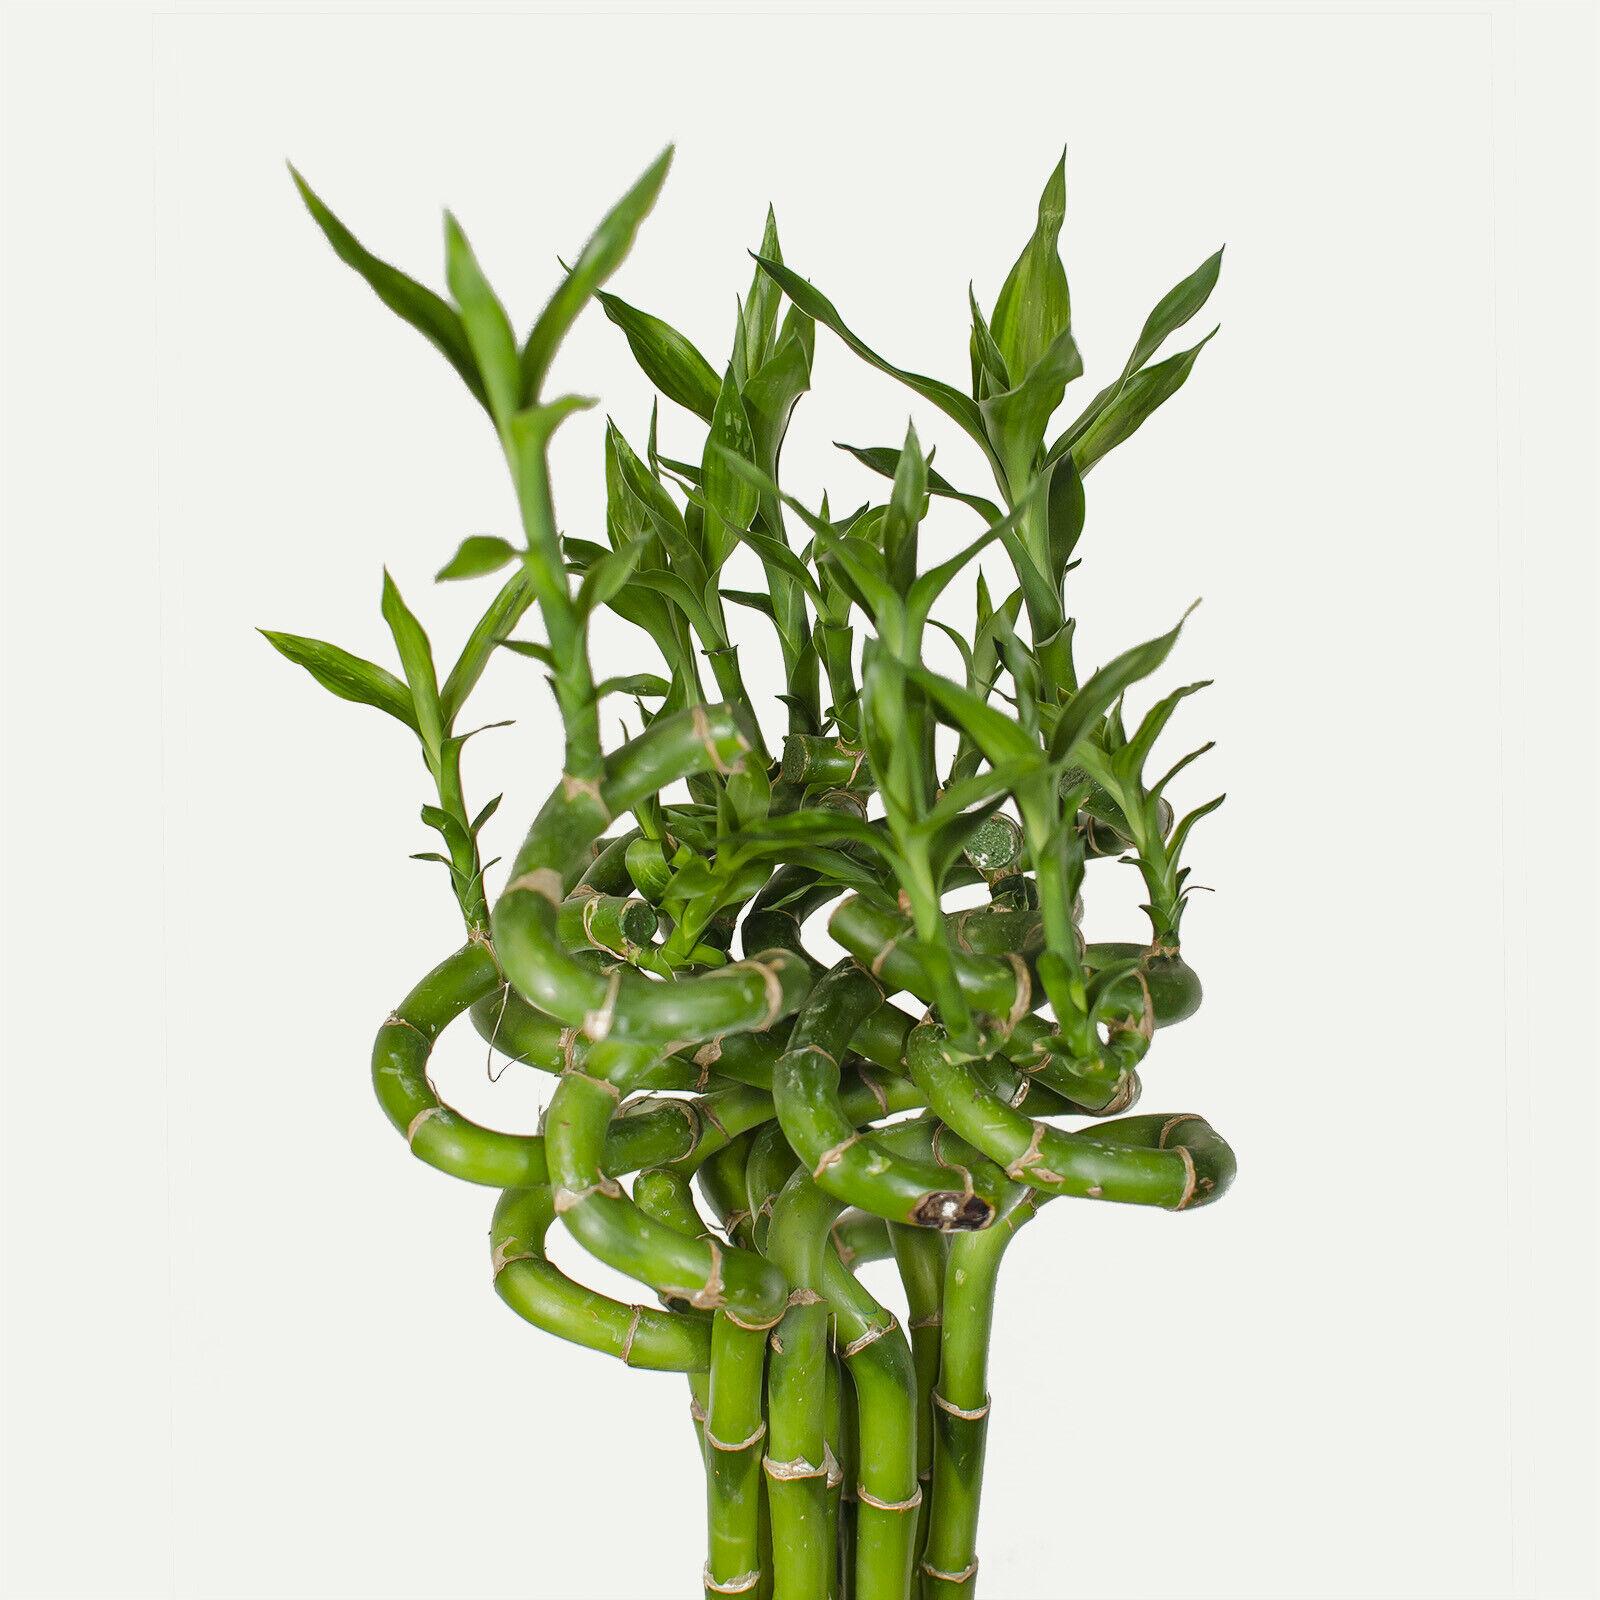 10stück Lucky Bambú sanderiana dracaena bambú de la suerte 100cm Largo